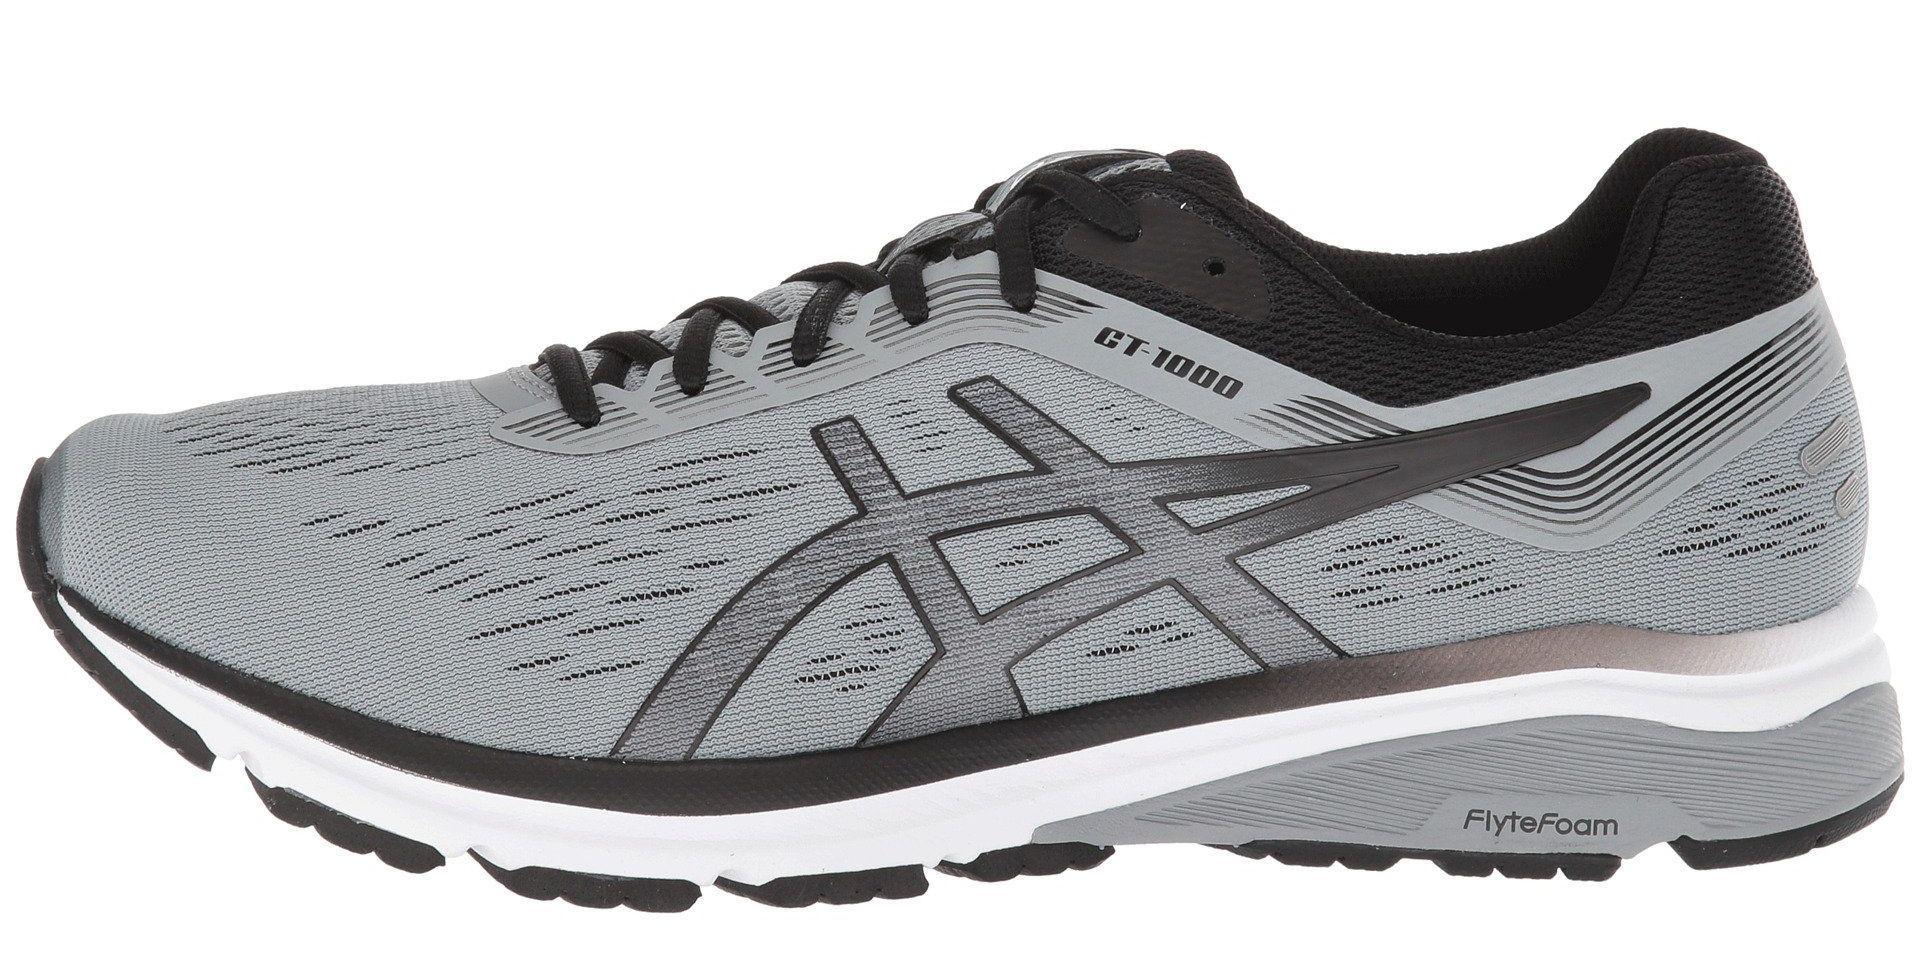 e520da44729280 Asics Running Shoes